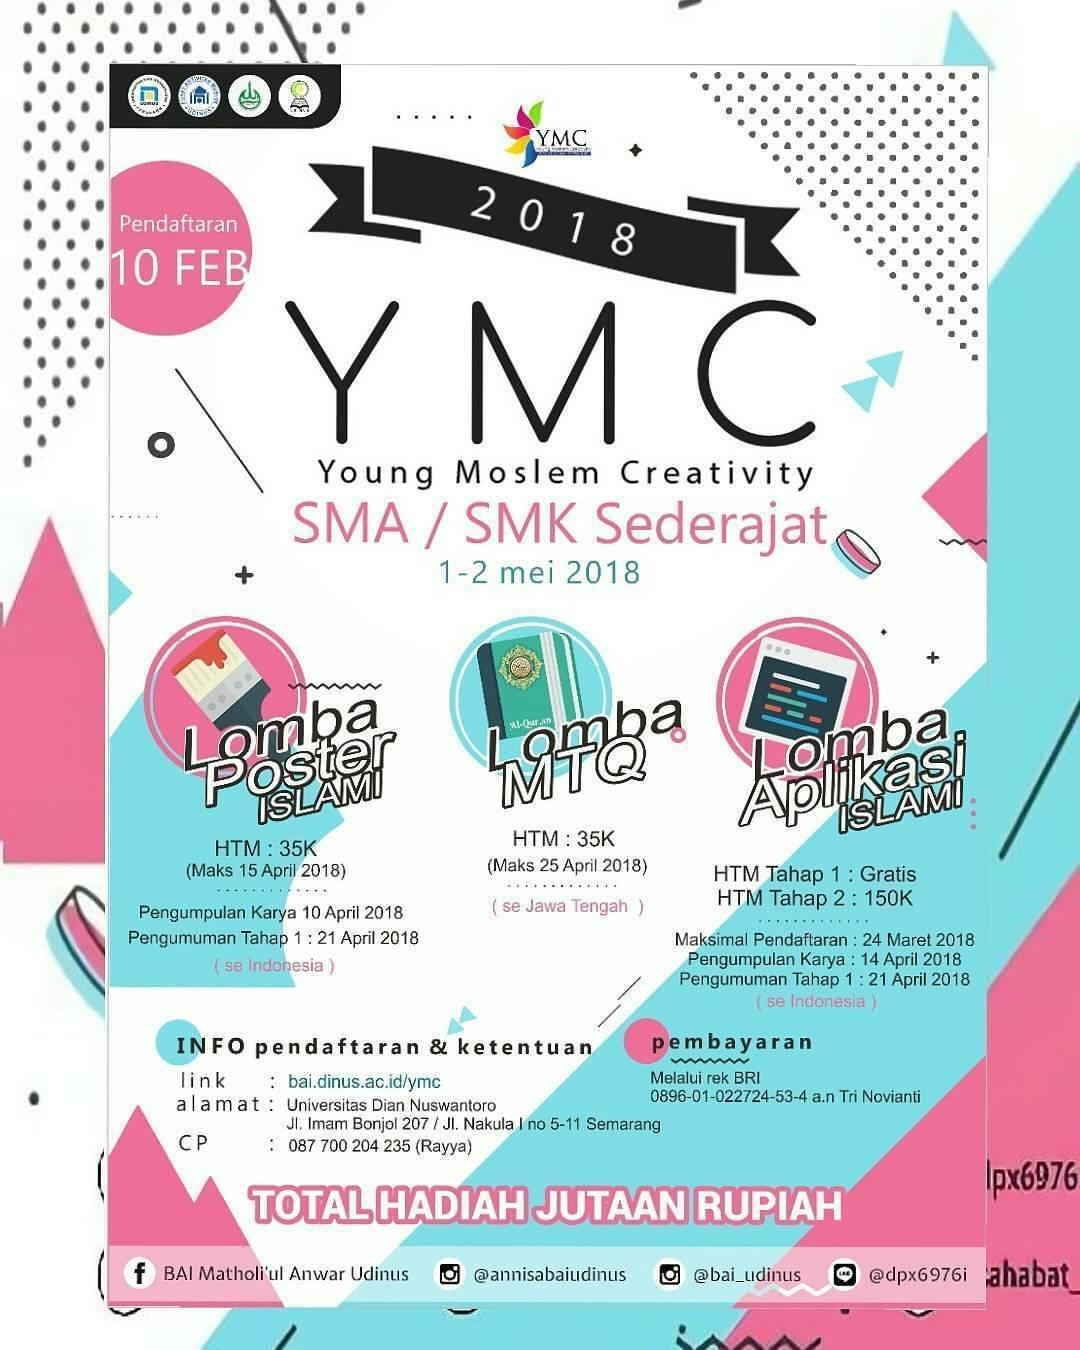 Event Ymc Young Moslem Creativity Di Udinus Semarang